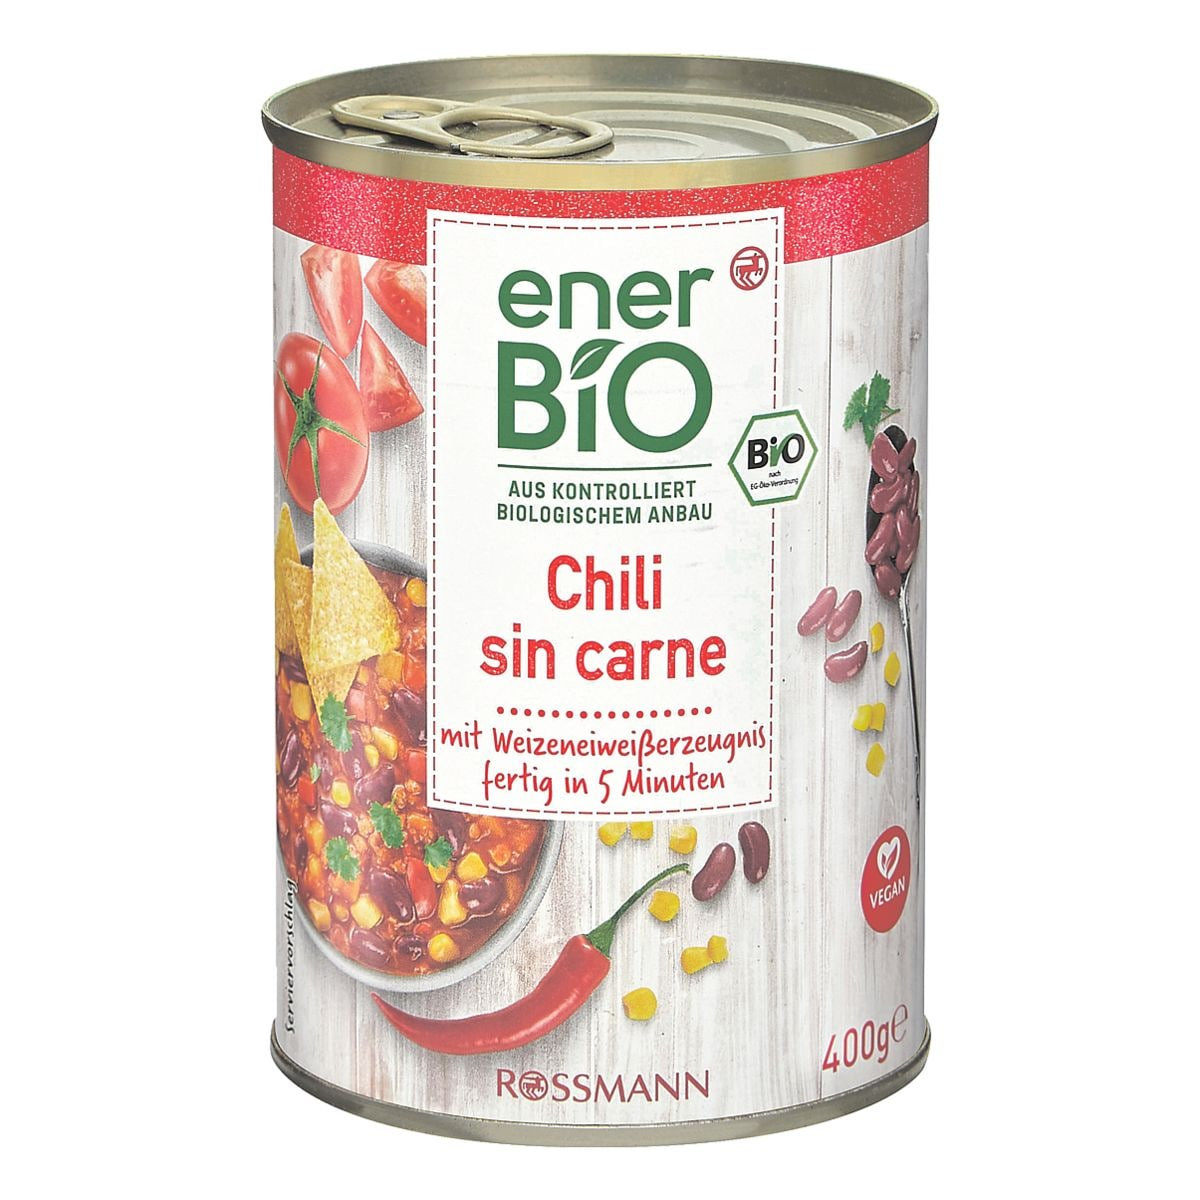 enerBIO Fertiggericht »Bio Chili sin carne« vegan